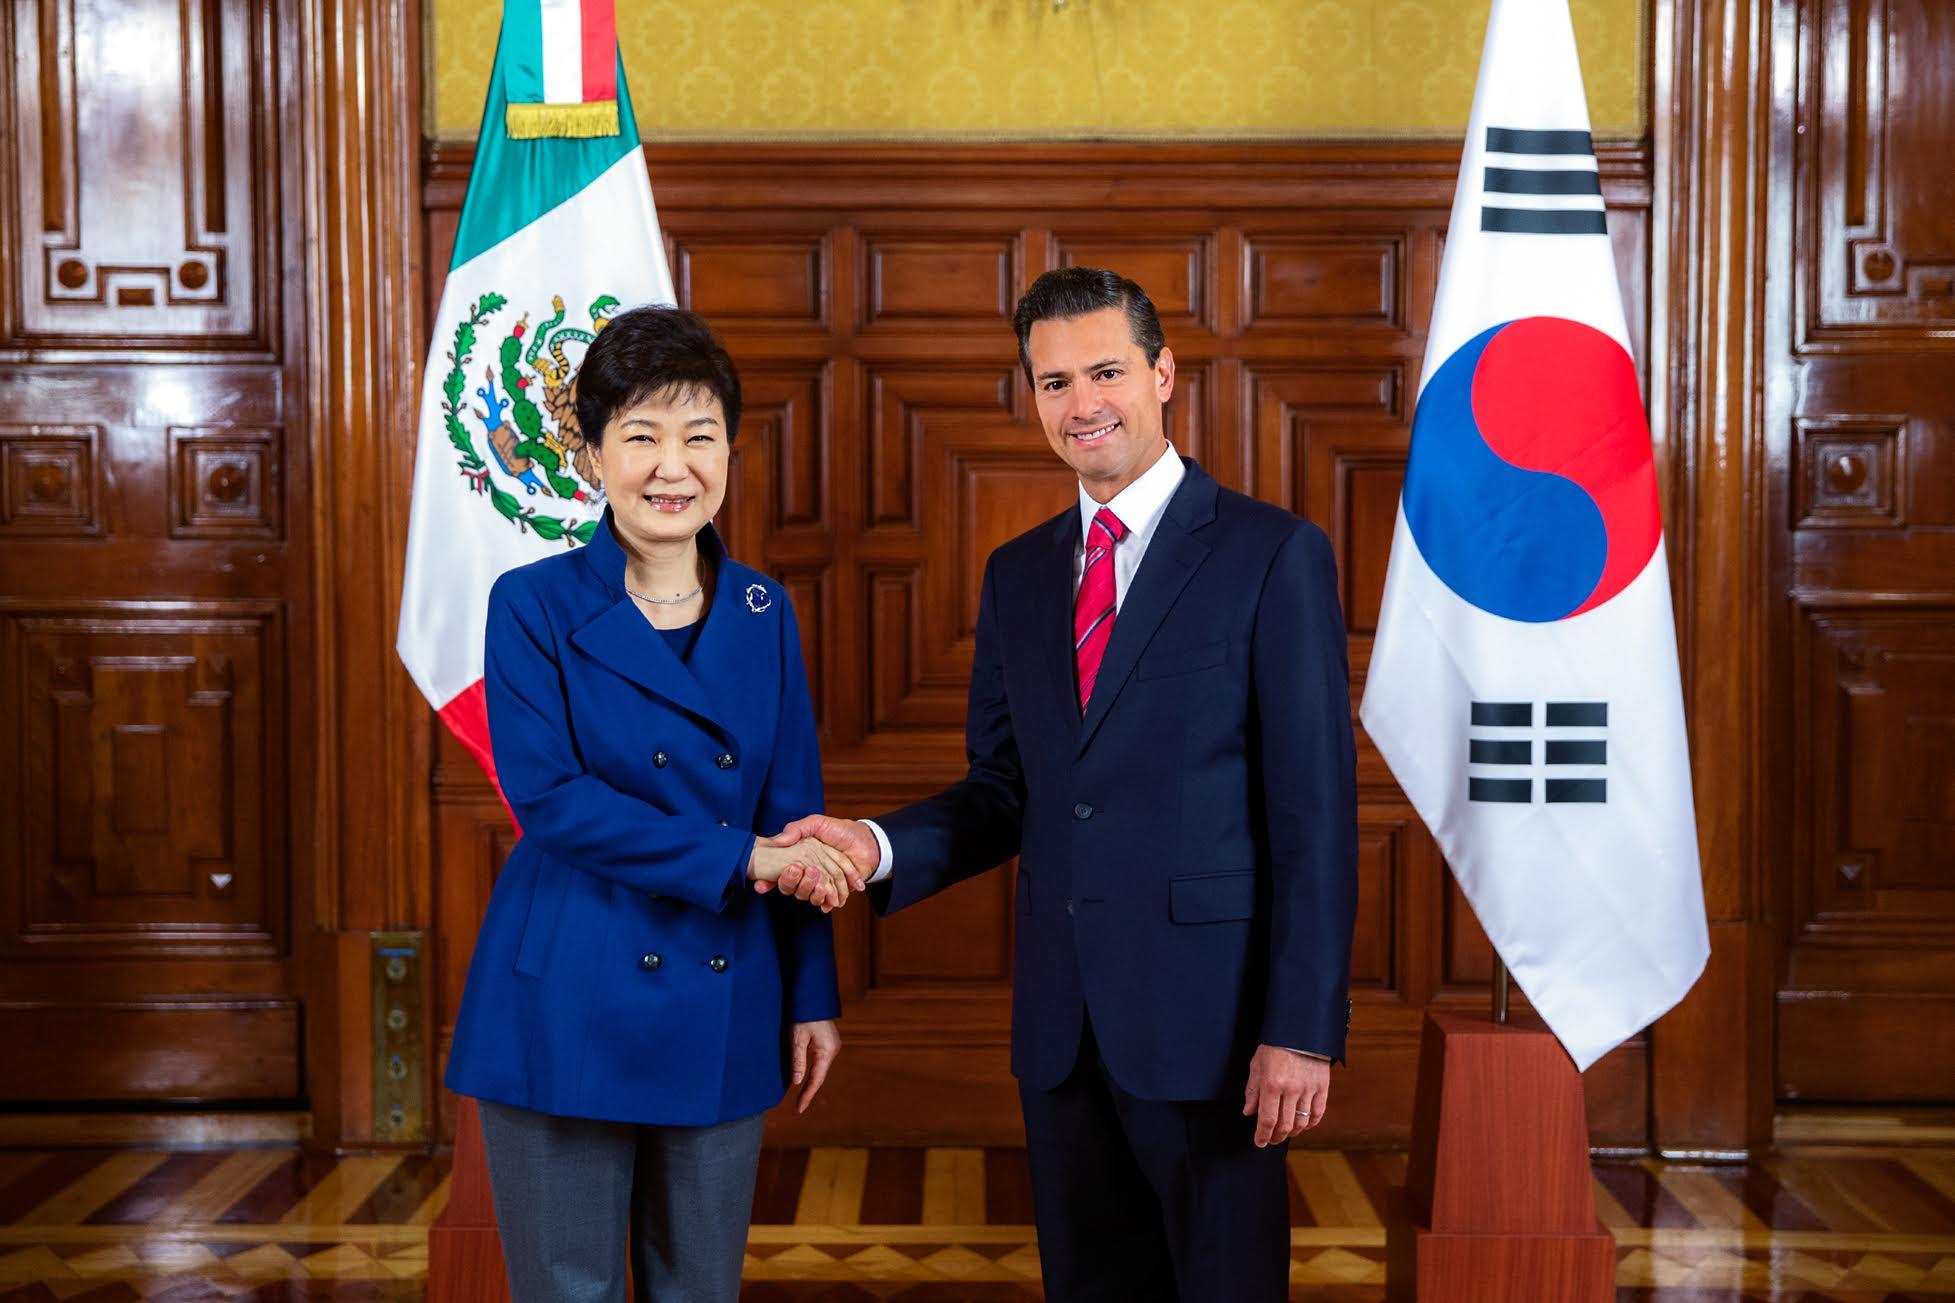 President Peña Nieto receives  President of Korea Park Geun-hye, currently on an official visit to Mexico.